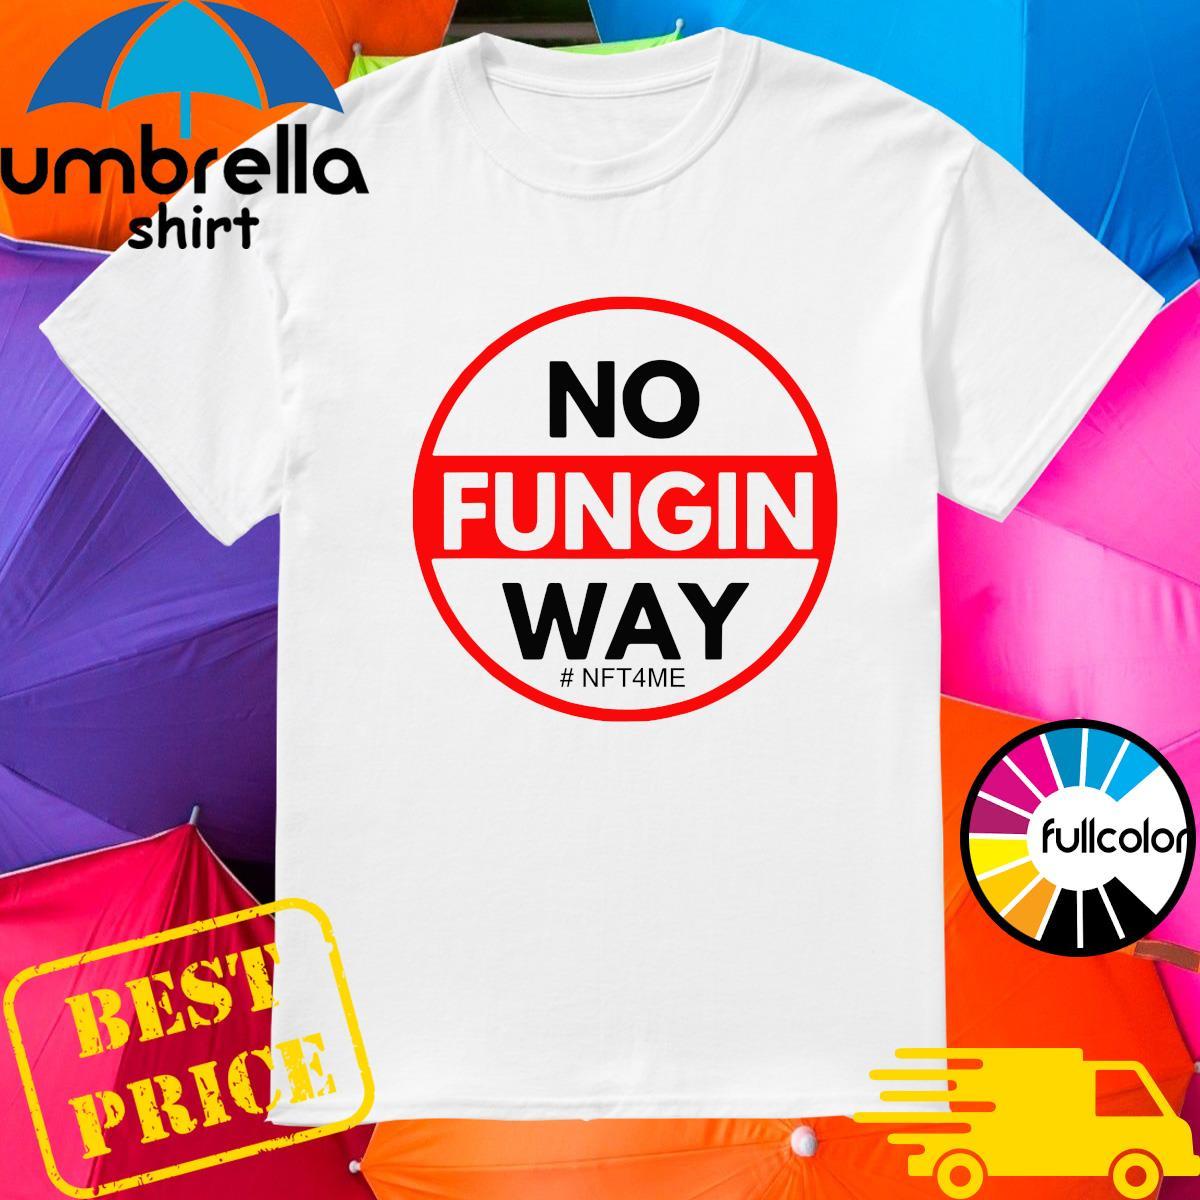 Official No Fungin Way #NFT4ME shirt